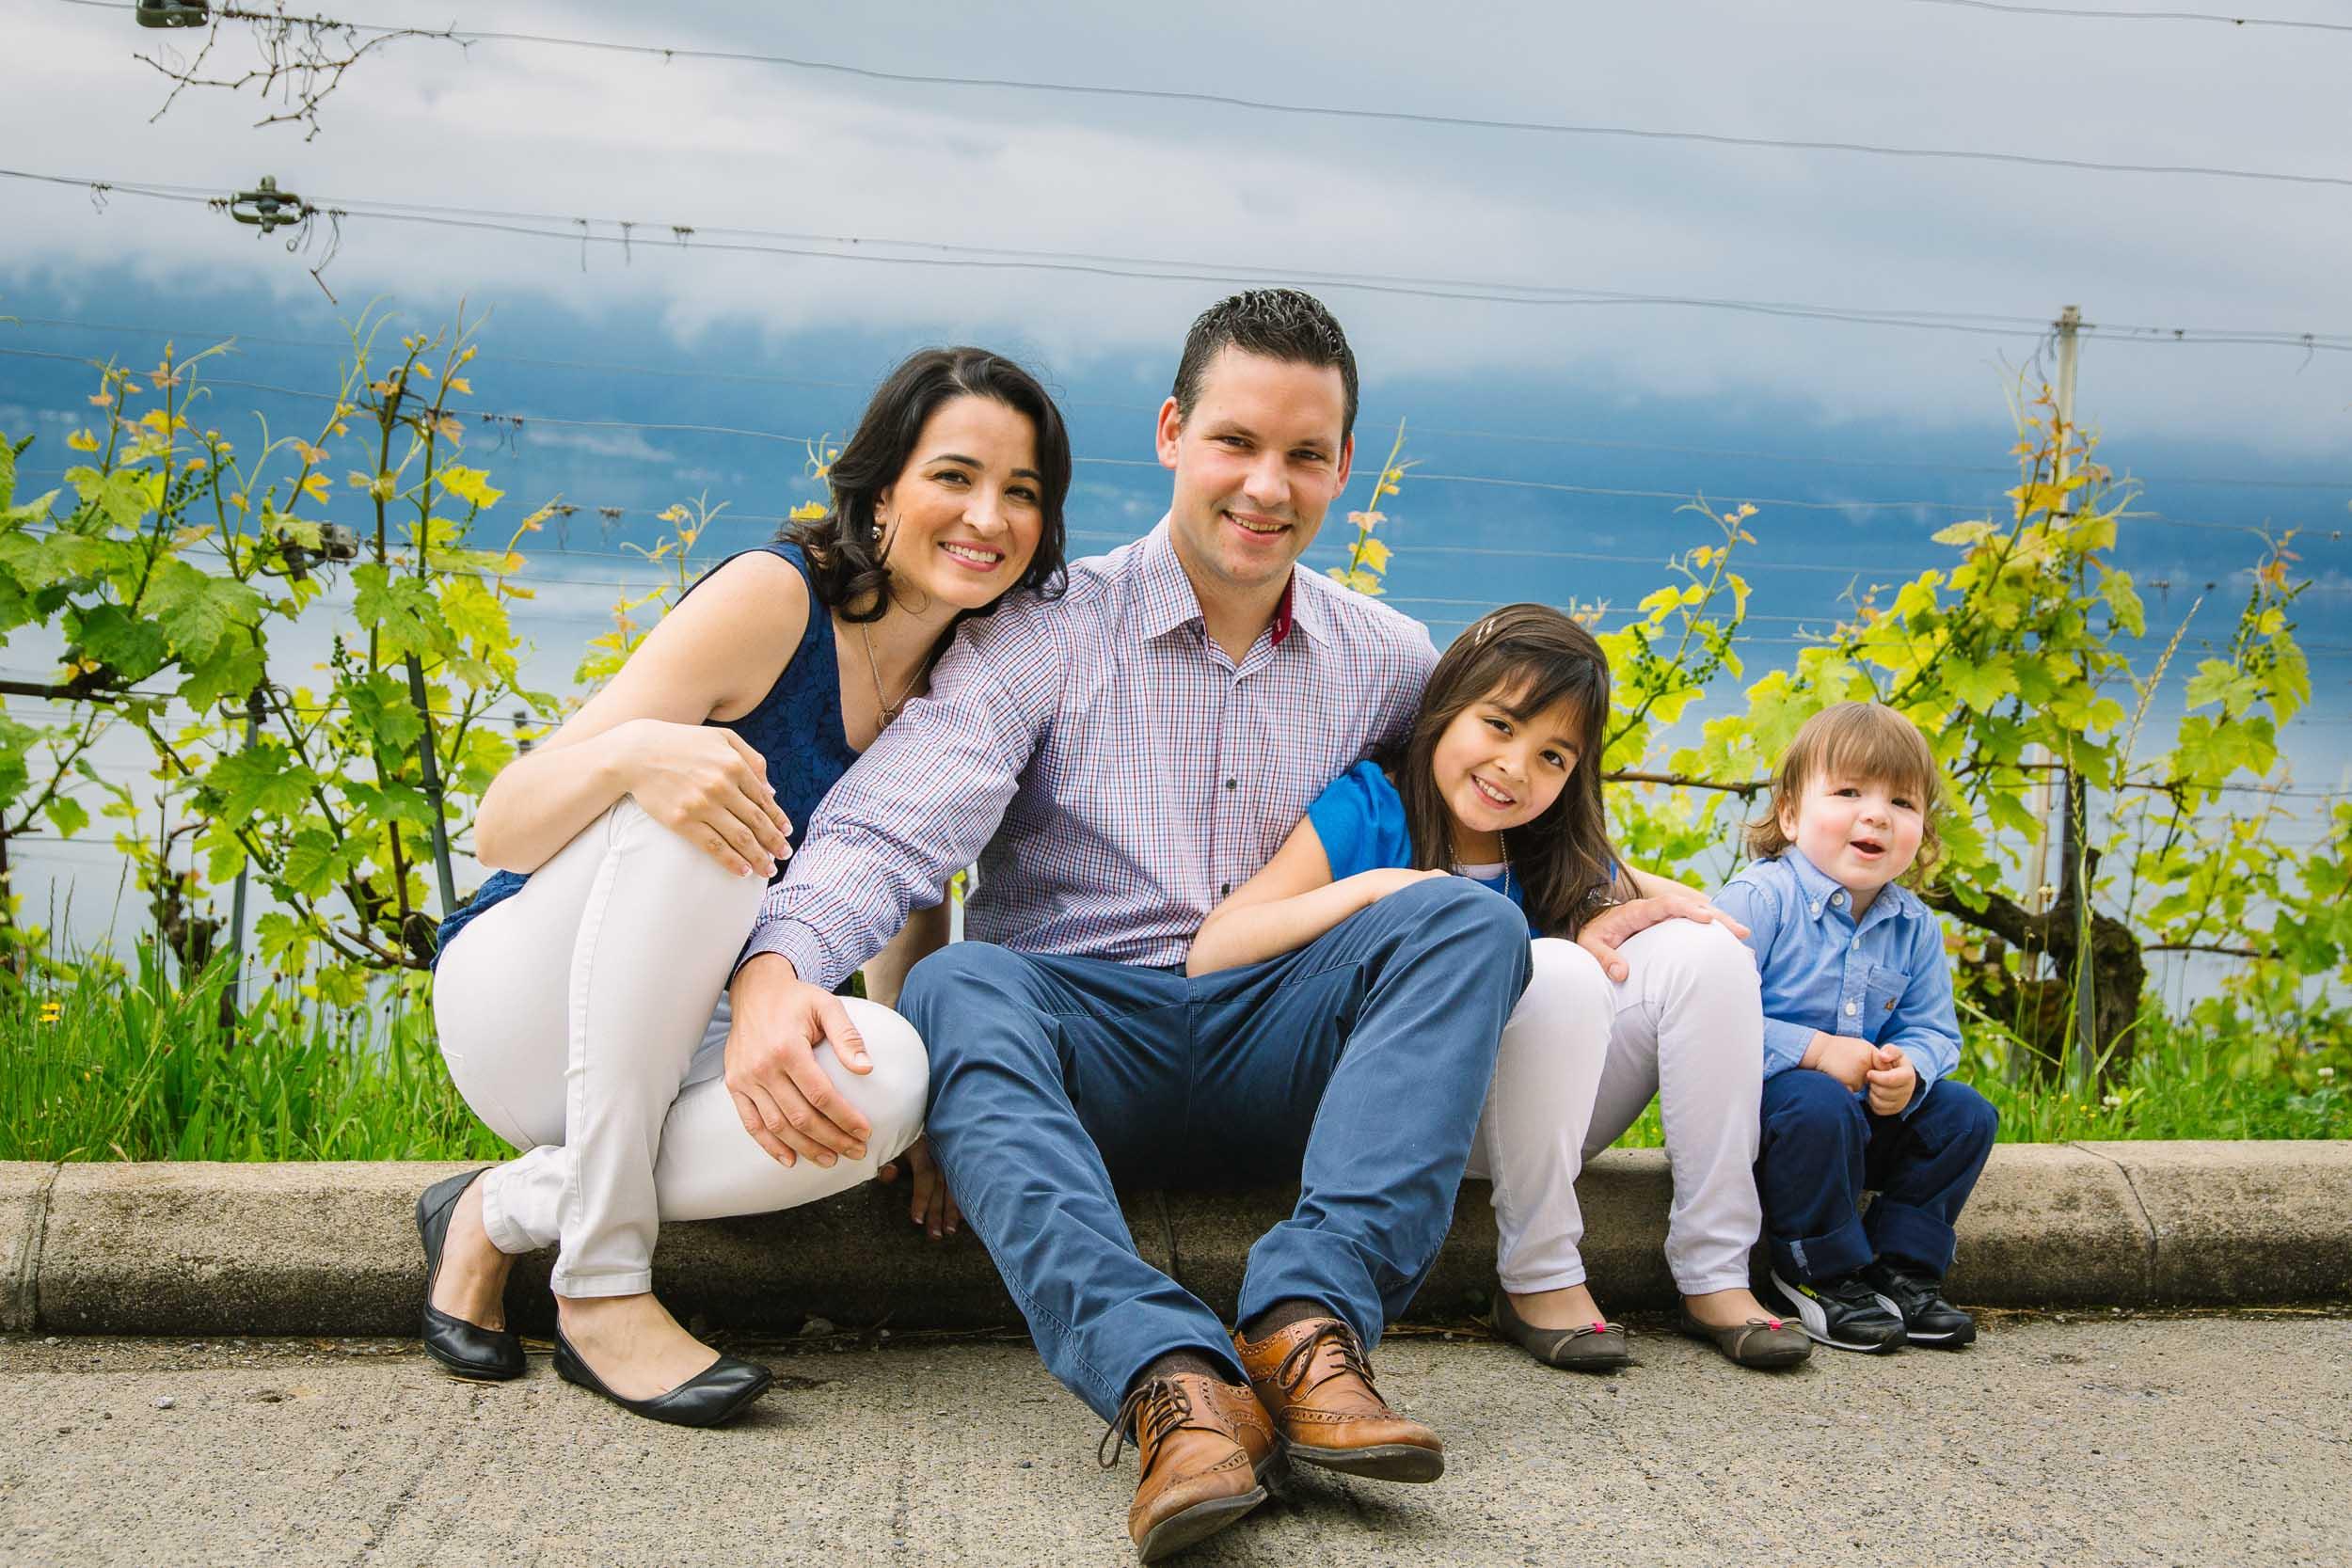 Vineyard Family Photo Shoot